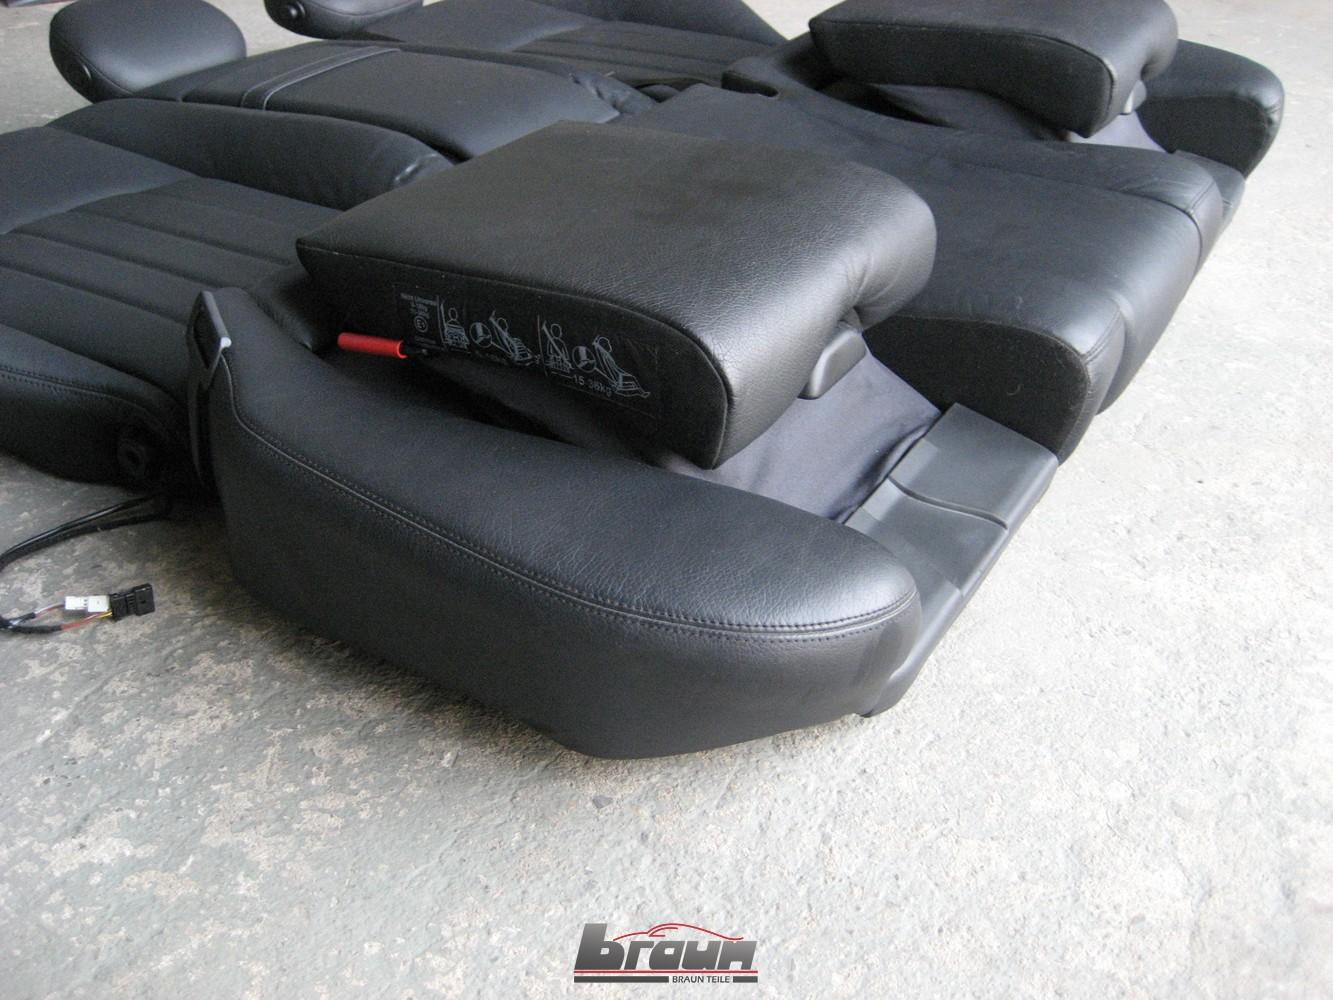 r cksitzbank kindersitz mercedes e klasse w211 s211 t modell kombi innenausstattung sitze. Black Bedroom Furniture Sets. Home Design Ideas